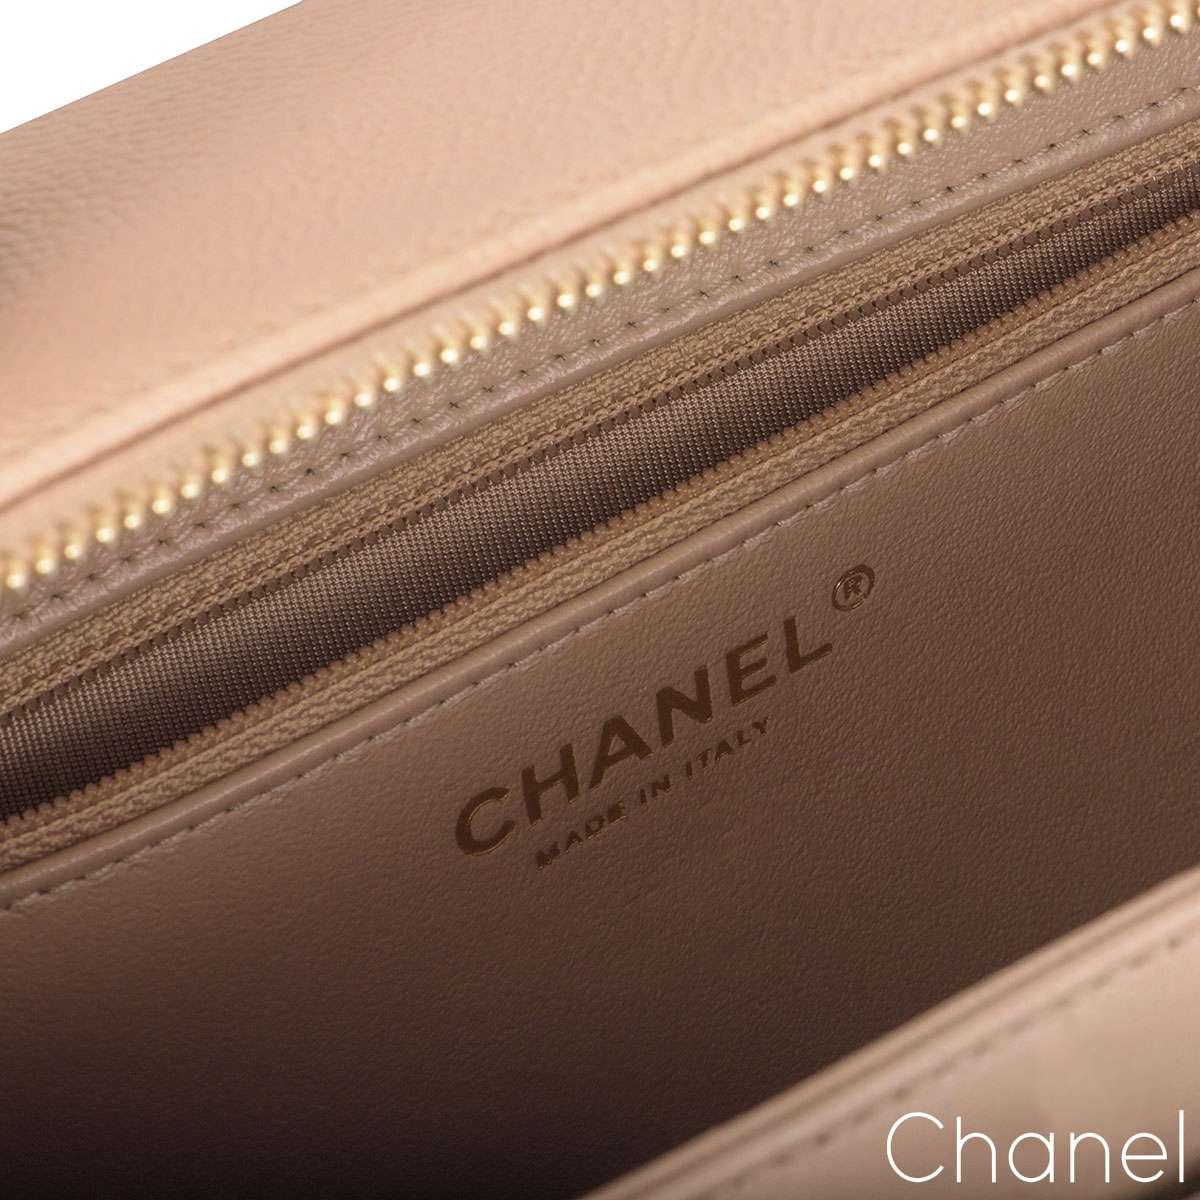 Chanel Large Vanity case Handbag